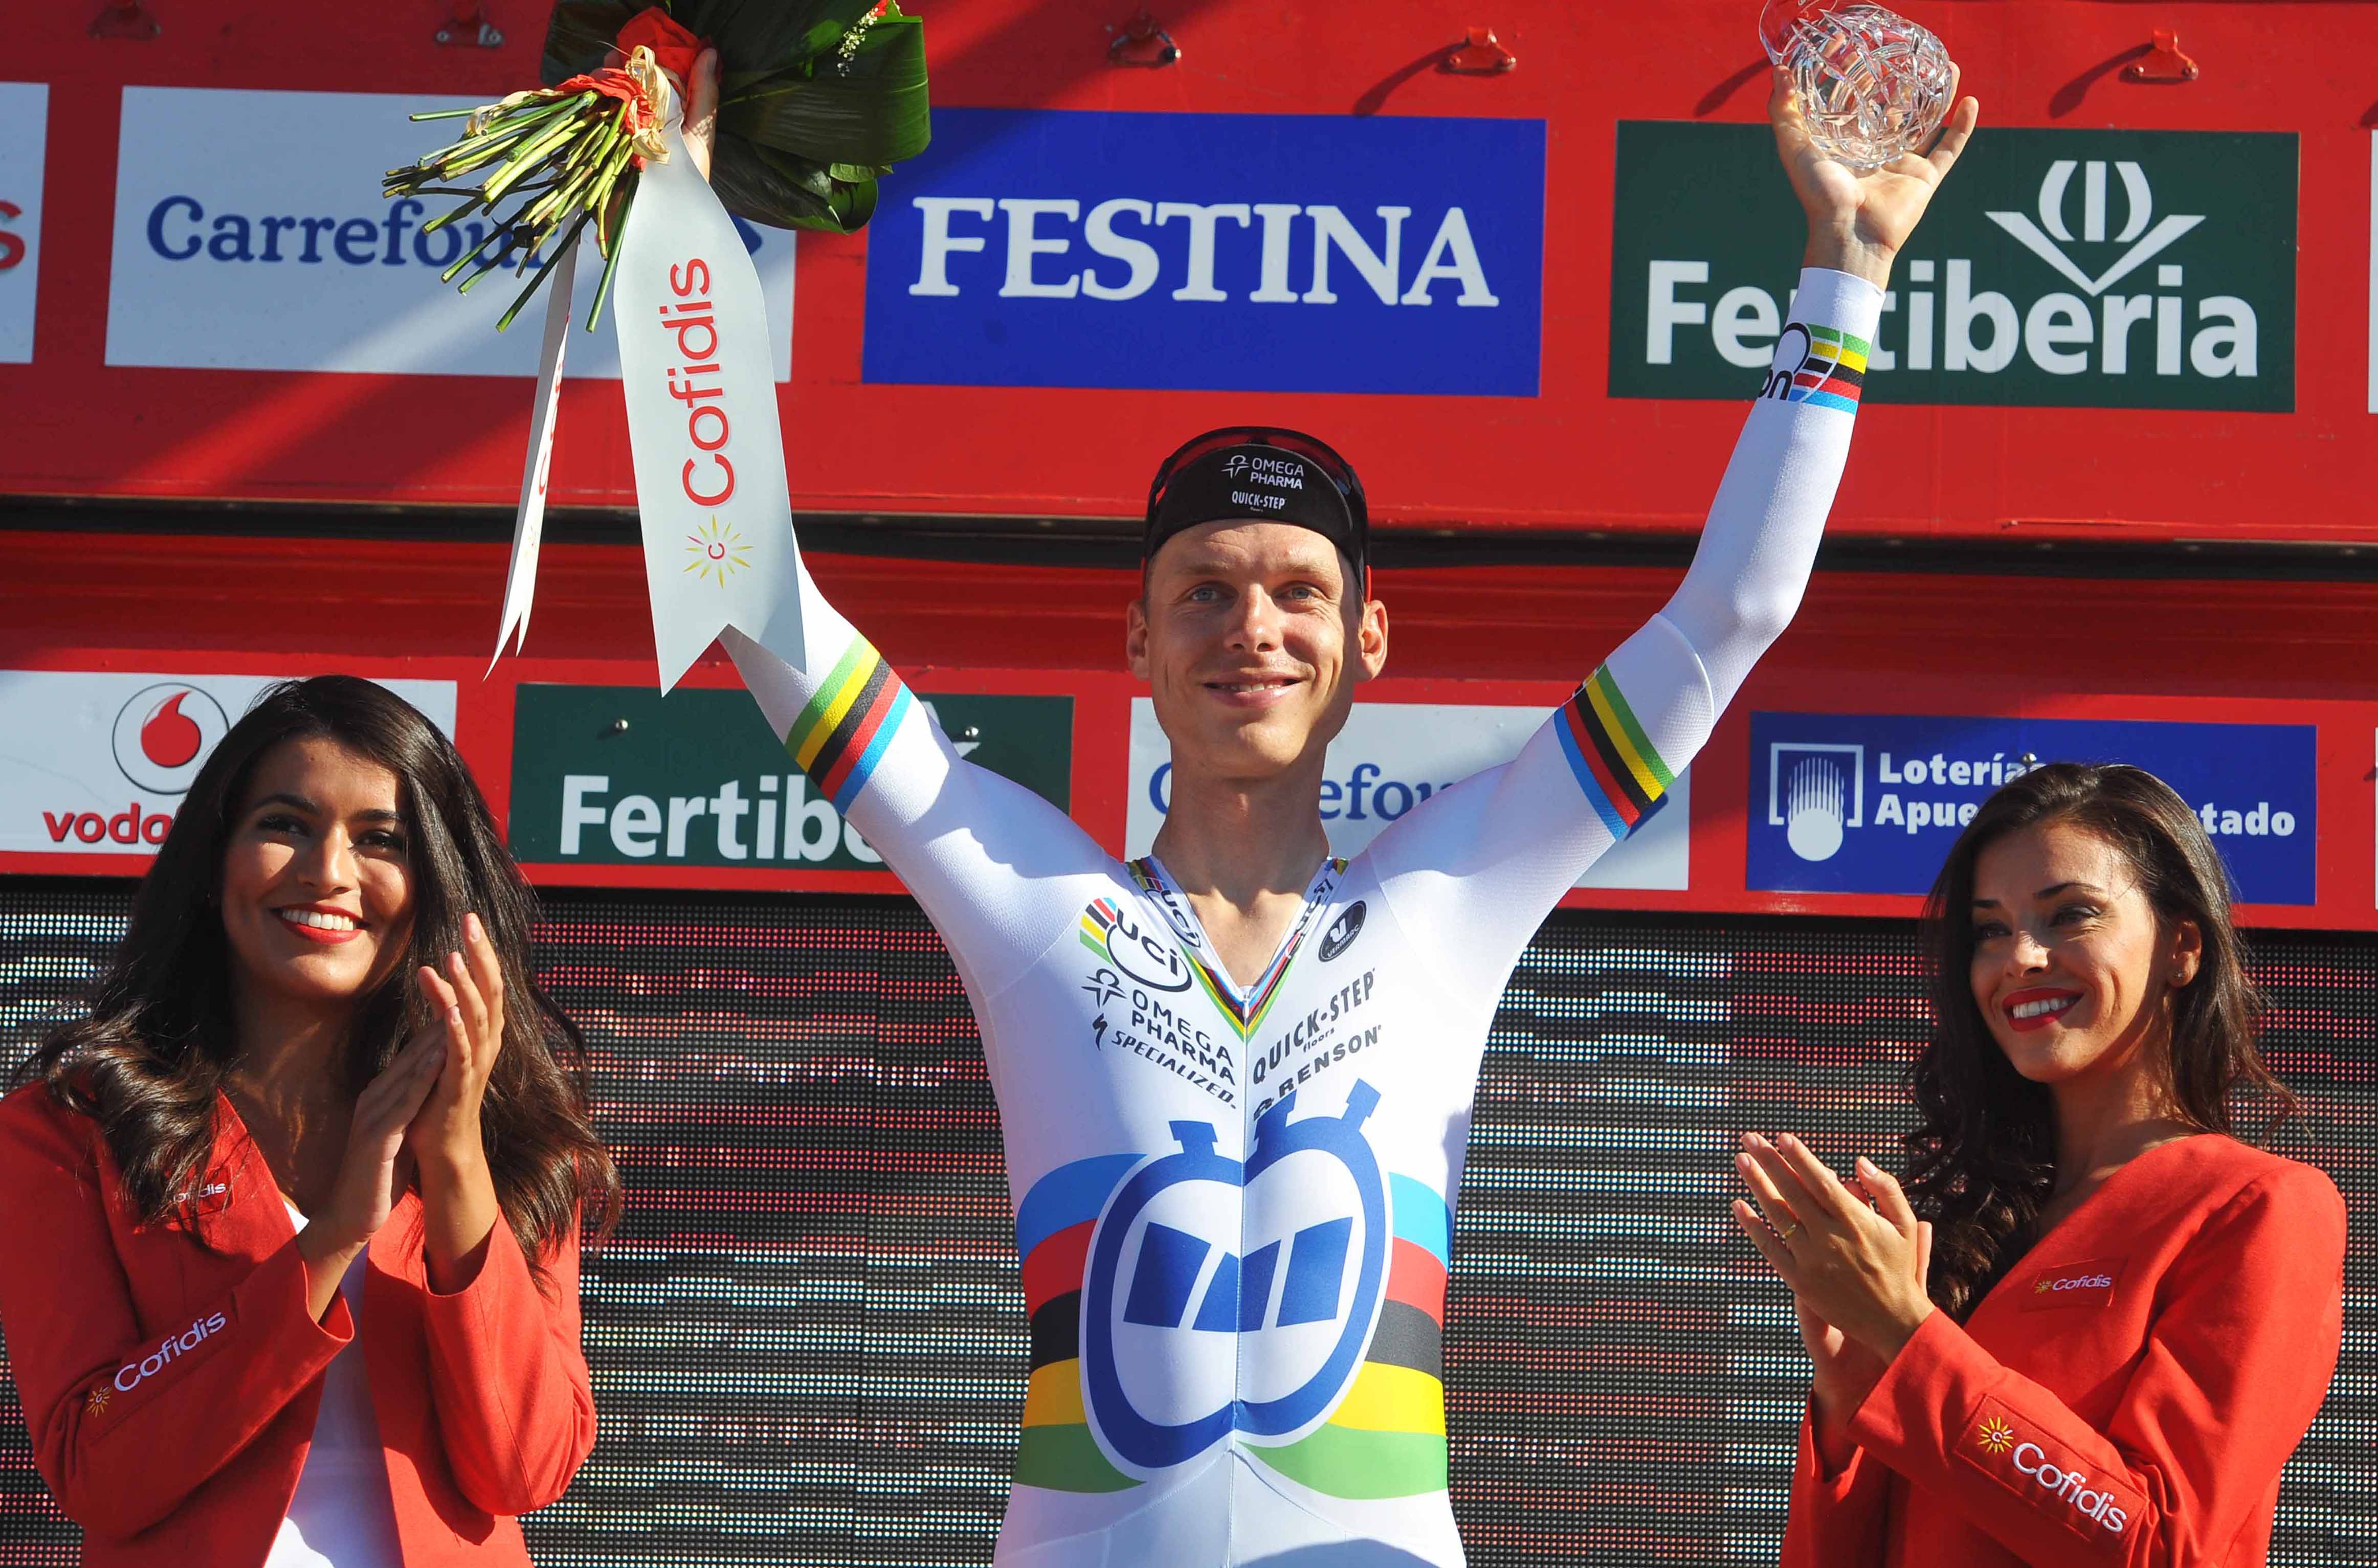 Tony Martin bei der Vuelta 2014